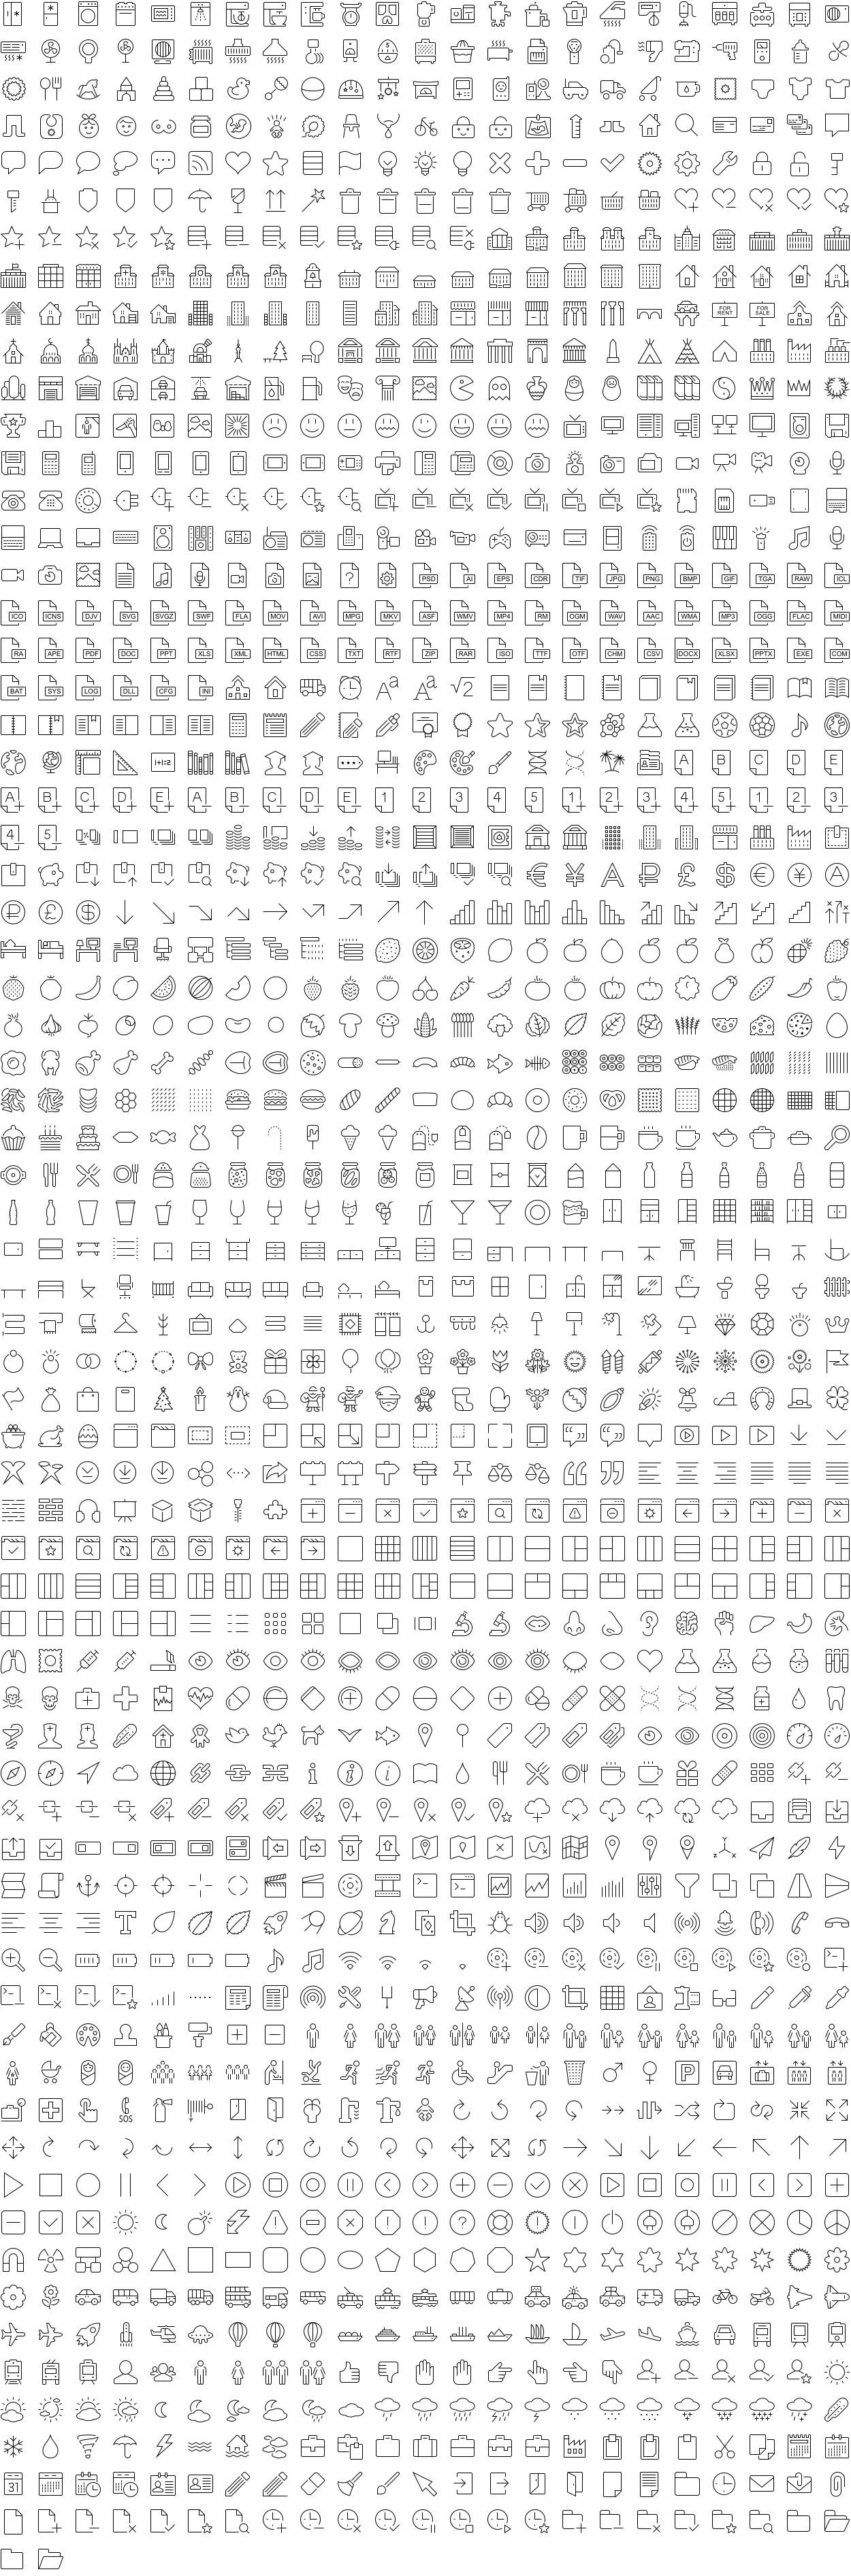 Eldorado Stroke icons full